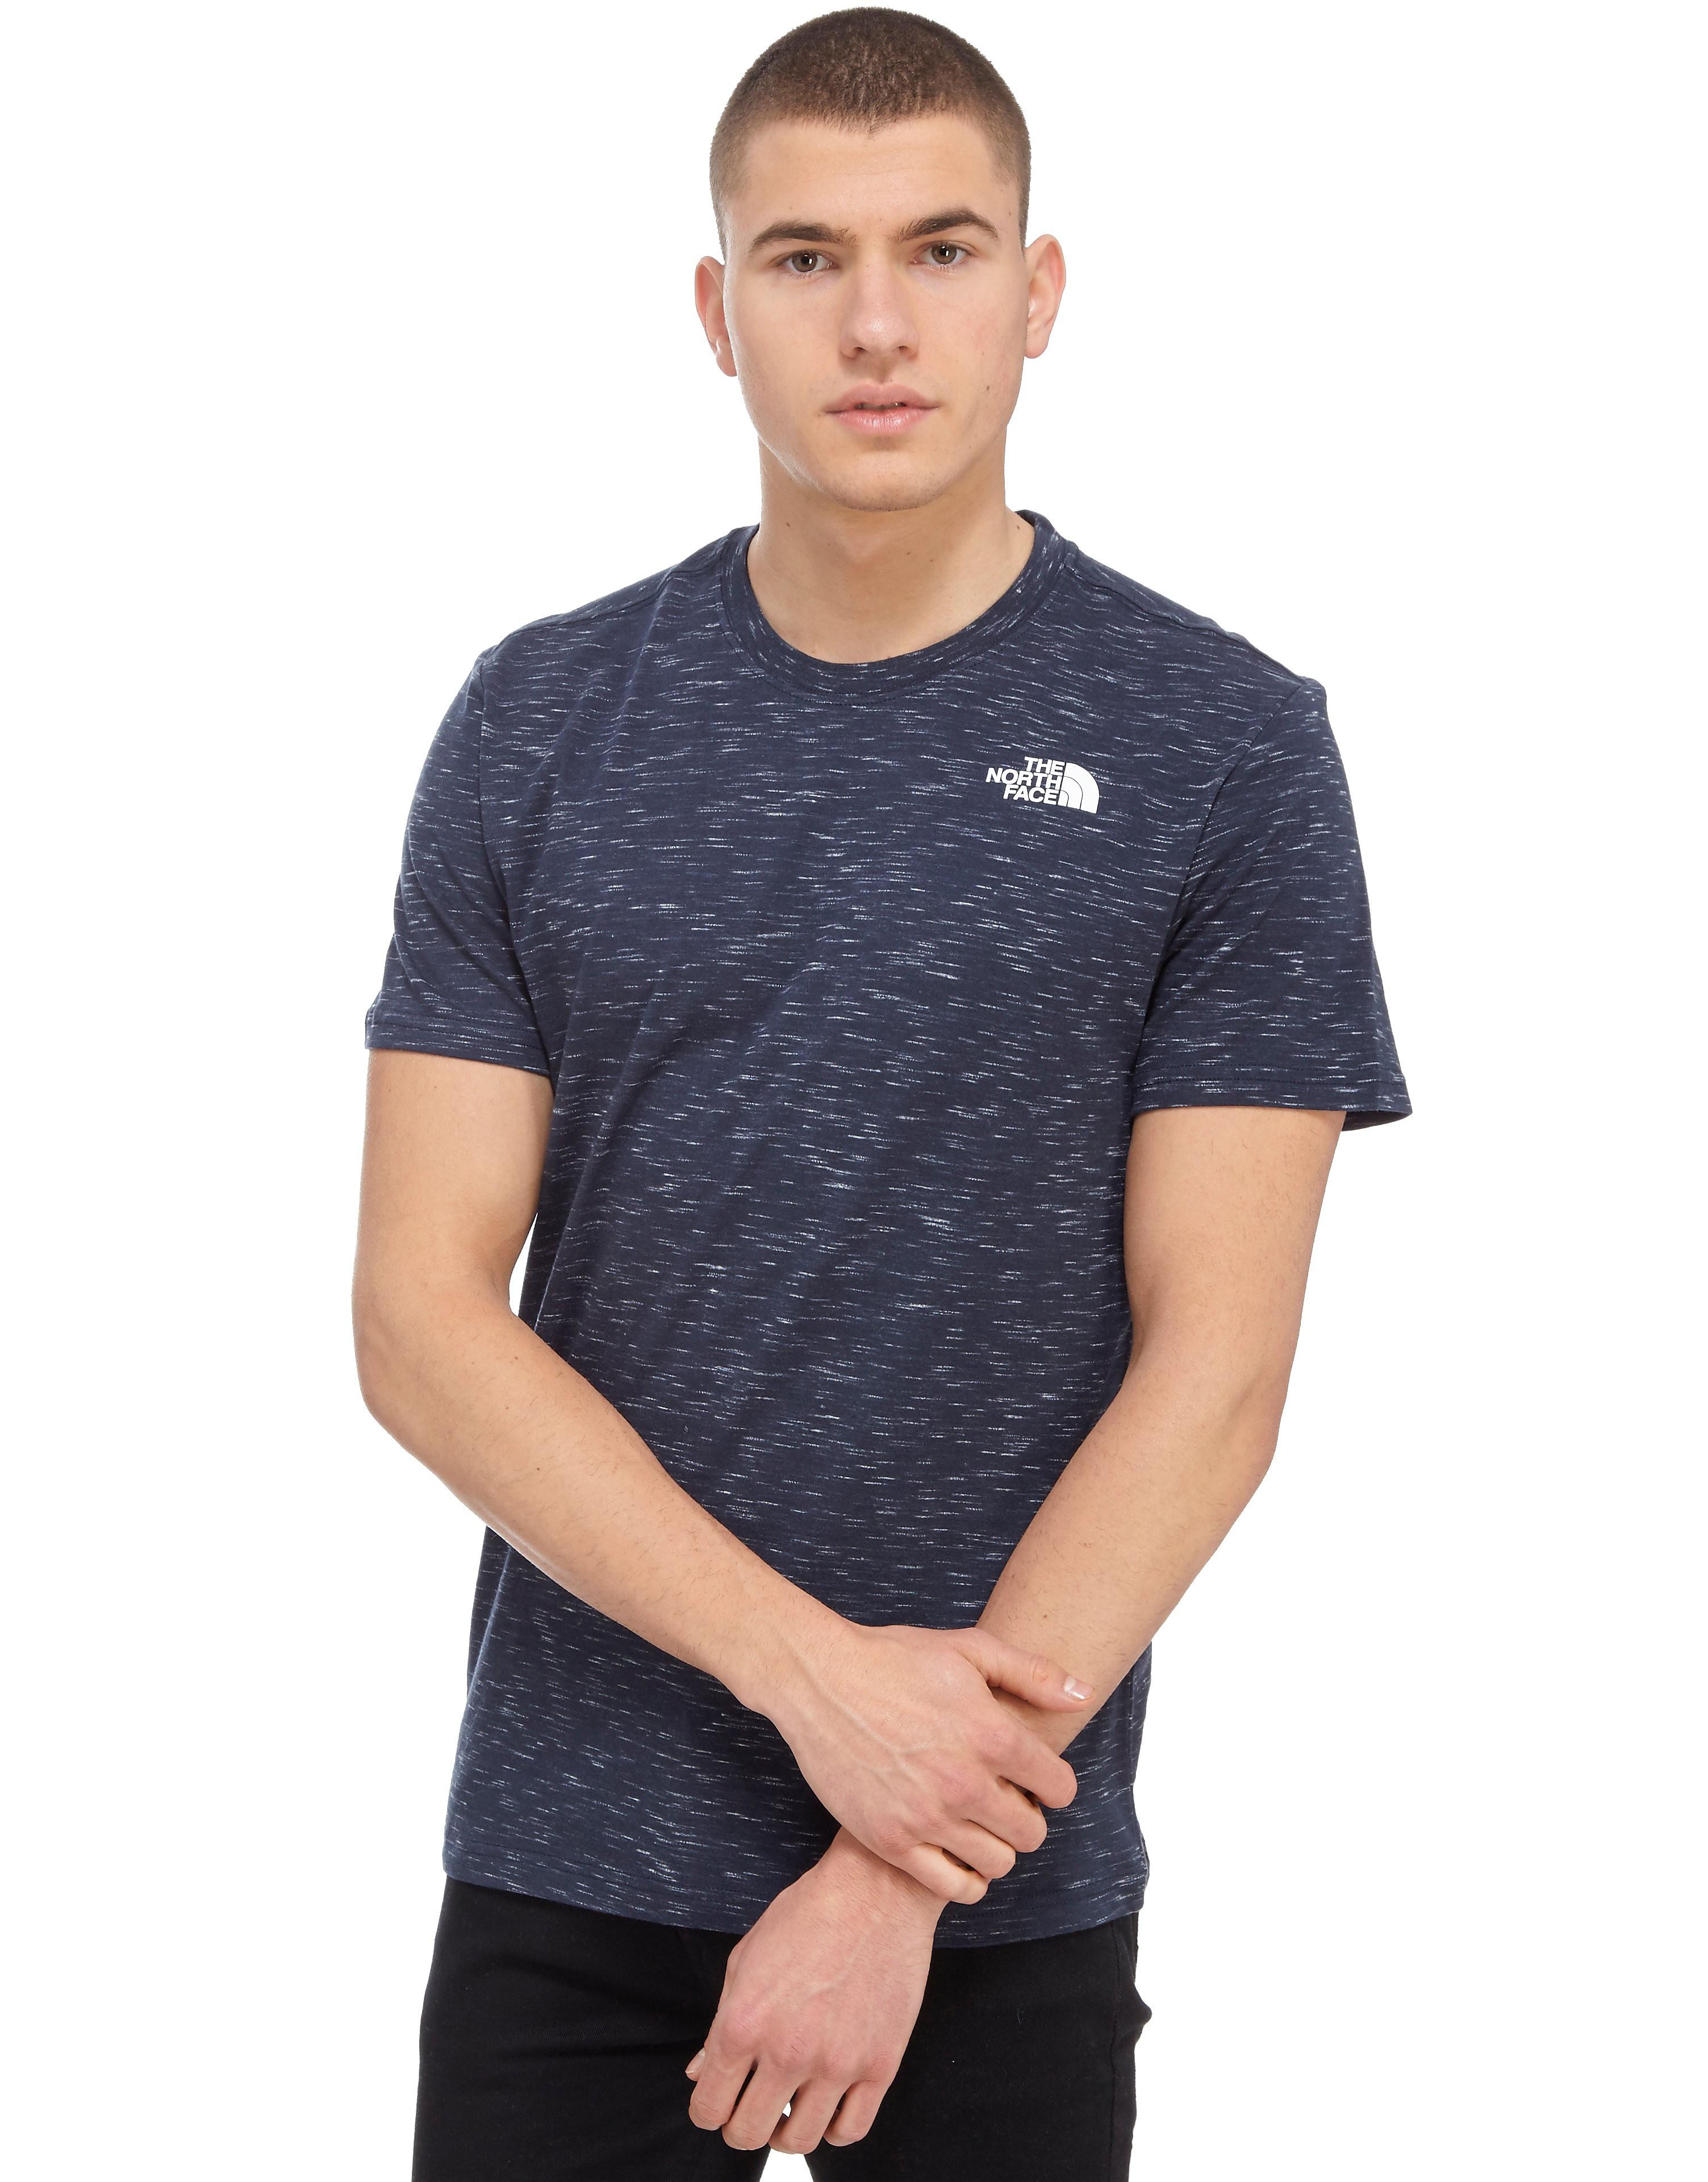 The North Face Redbox Infill T-Shirt